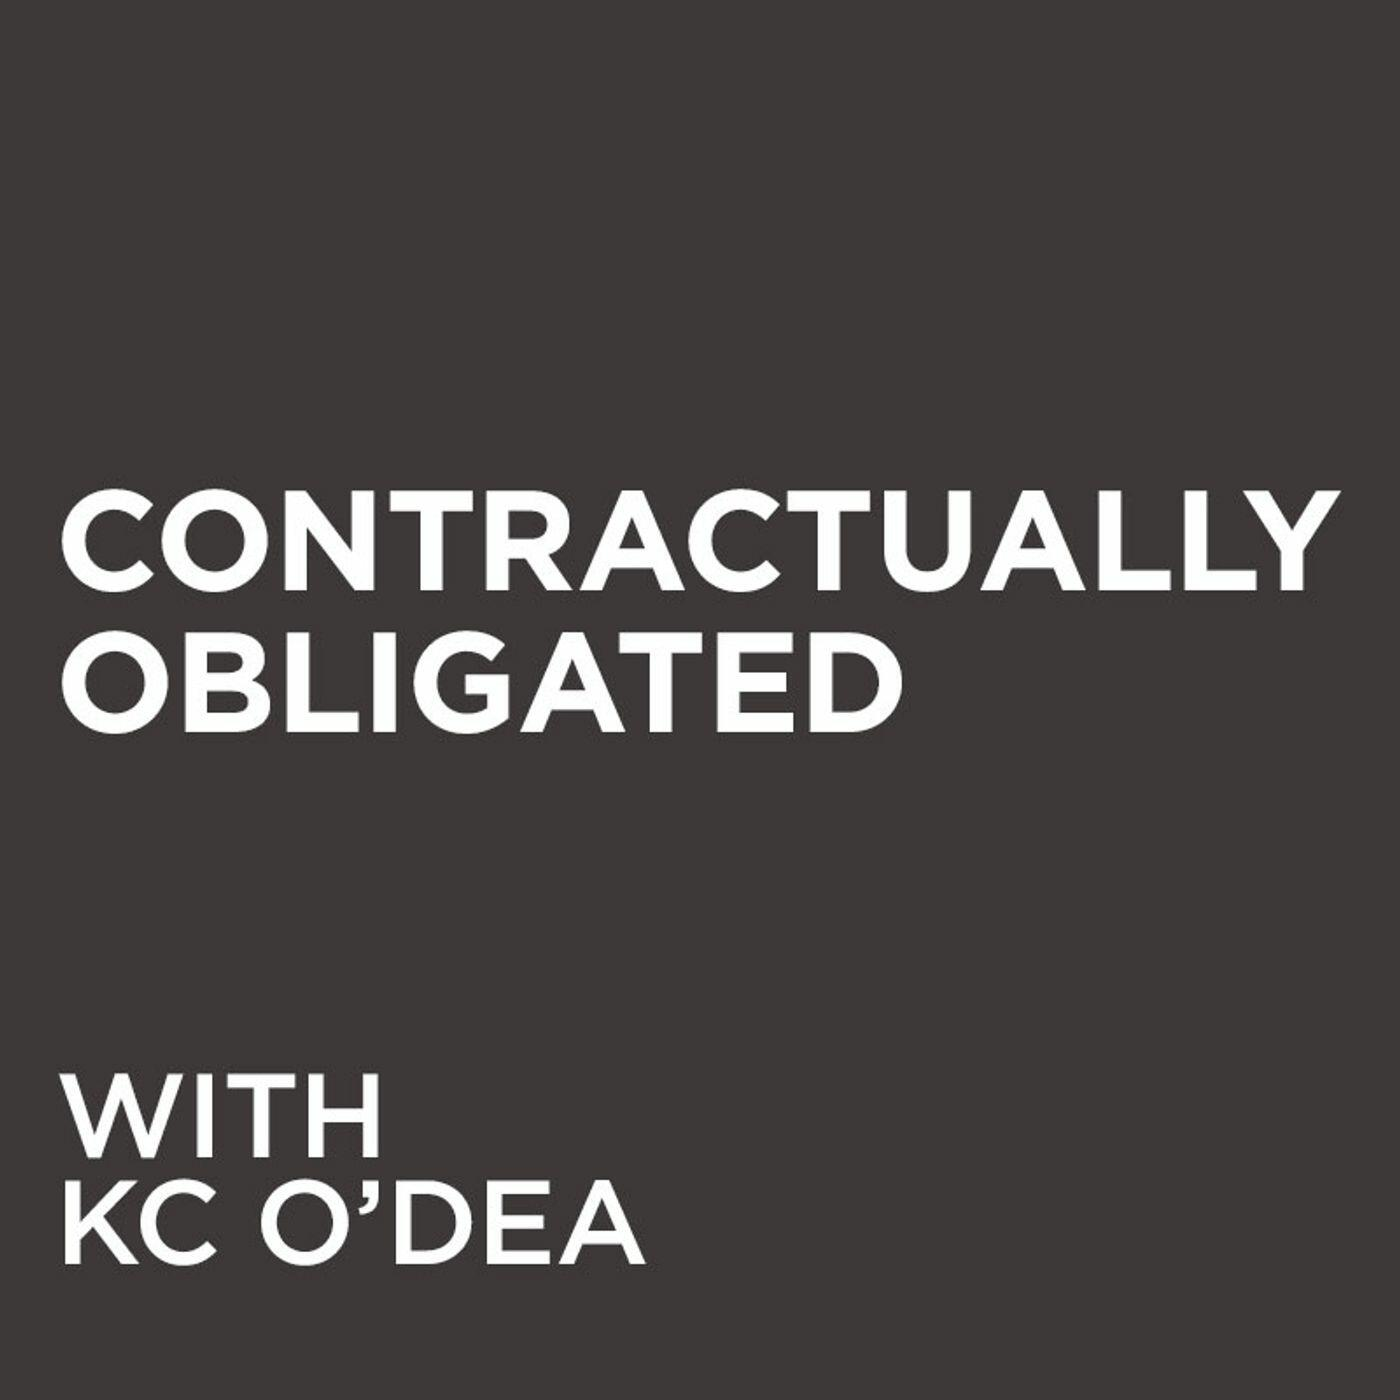 Contractually Obligated with KC O'Dea